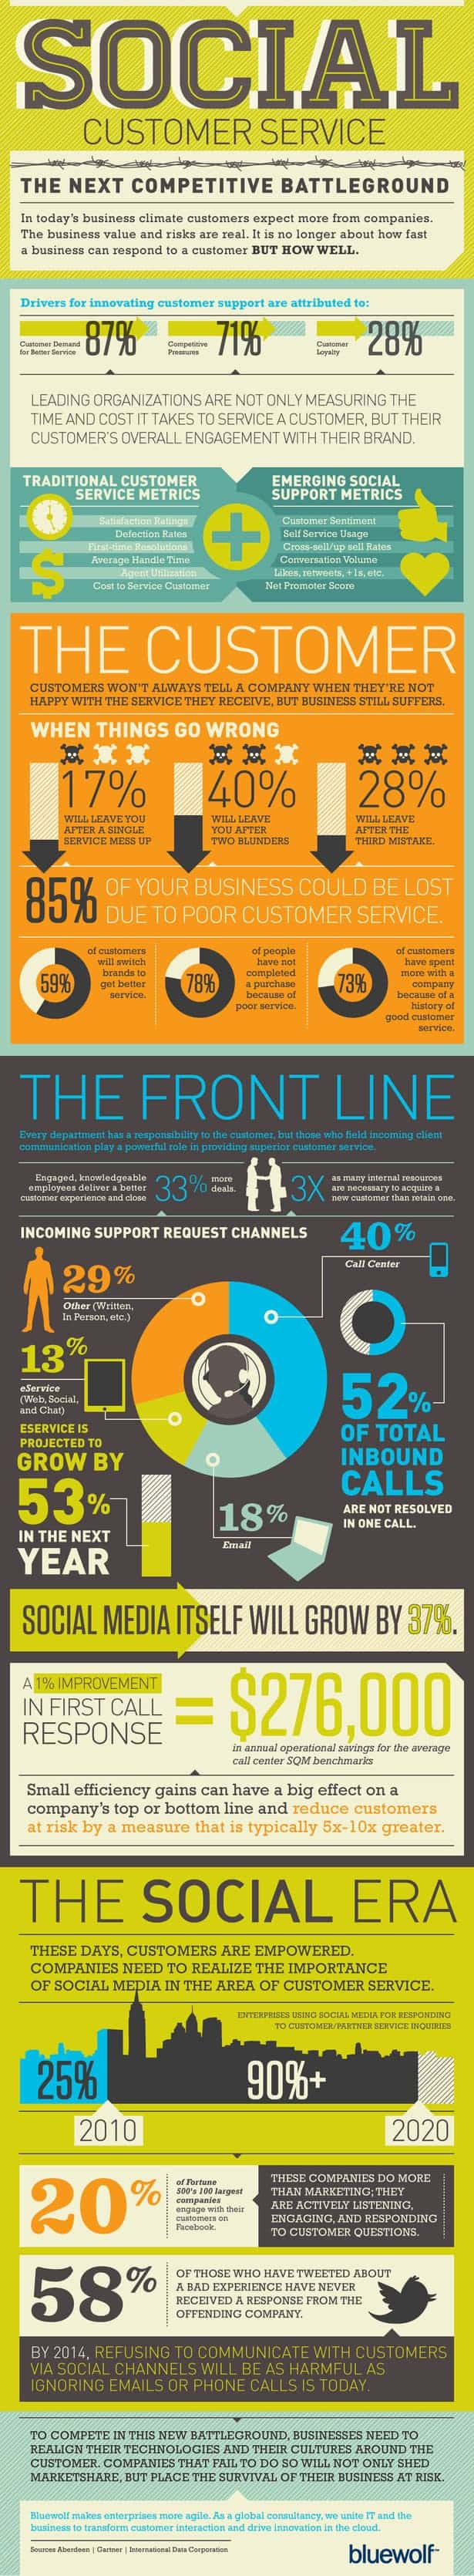 Social Media Customer Service Infographic